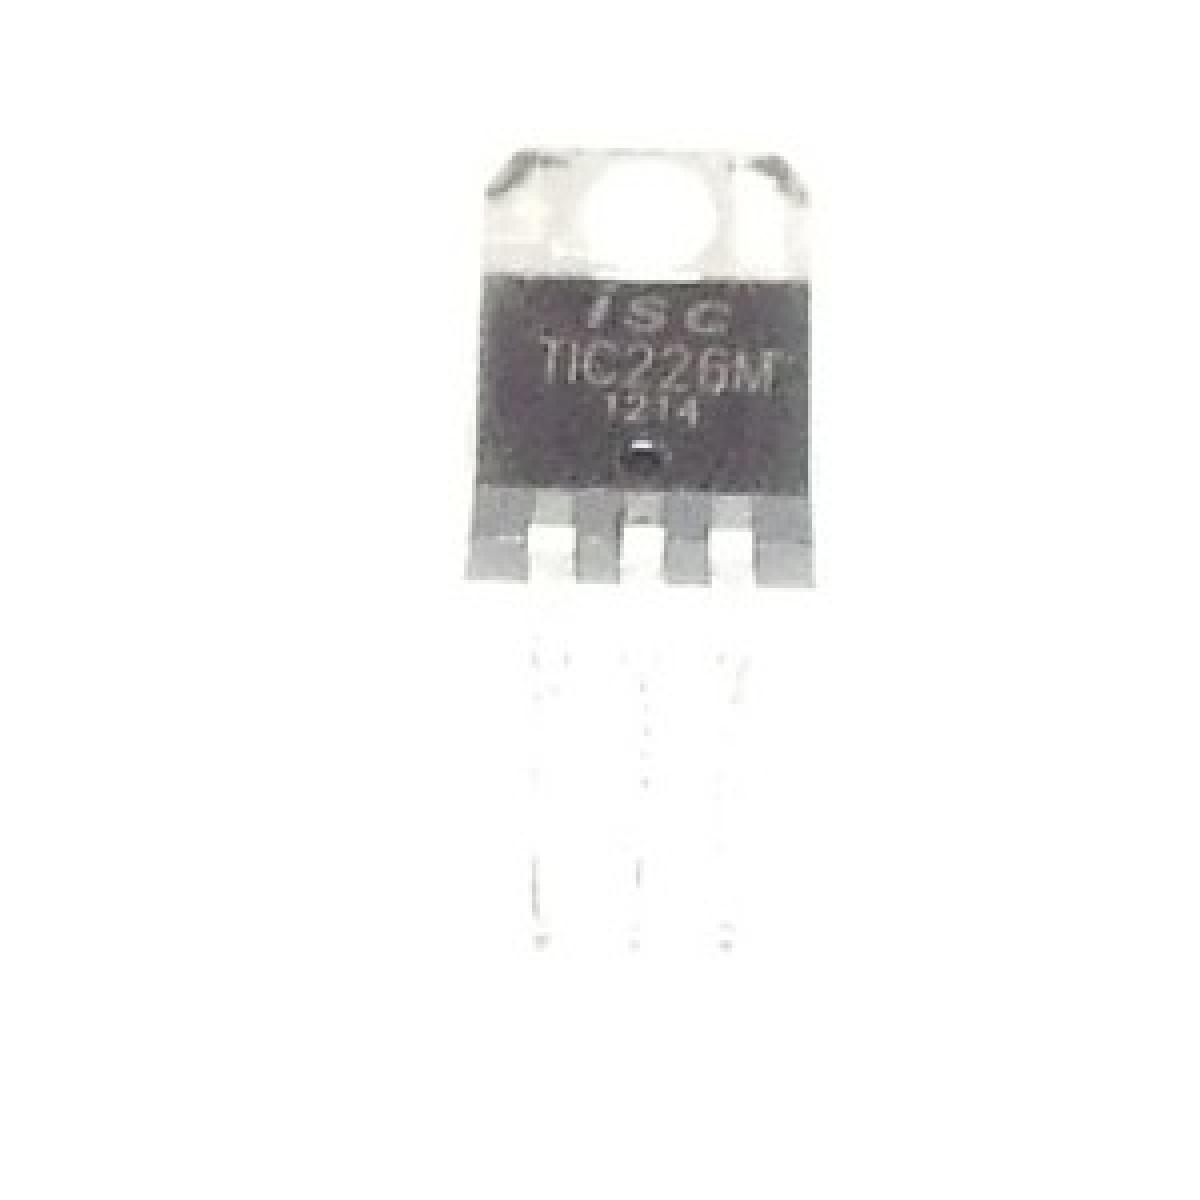 2 x tic116d TRIAC 400v 8a 5w ISC to-220 2pcs